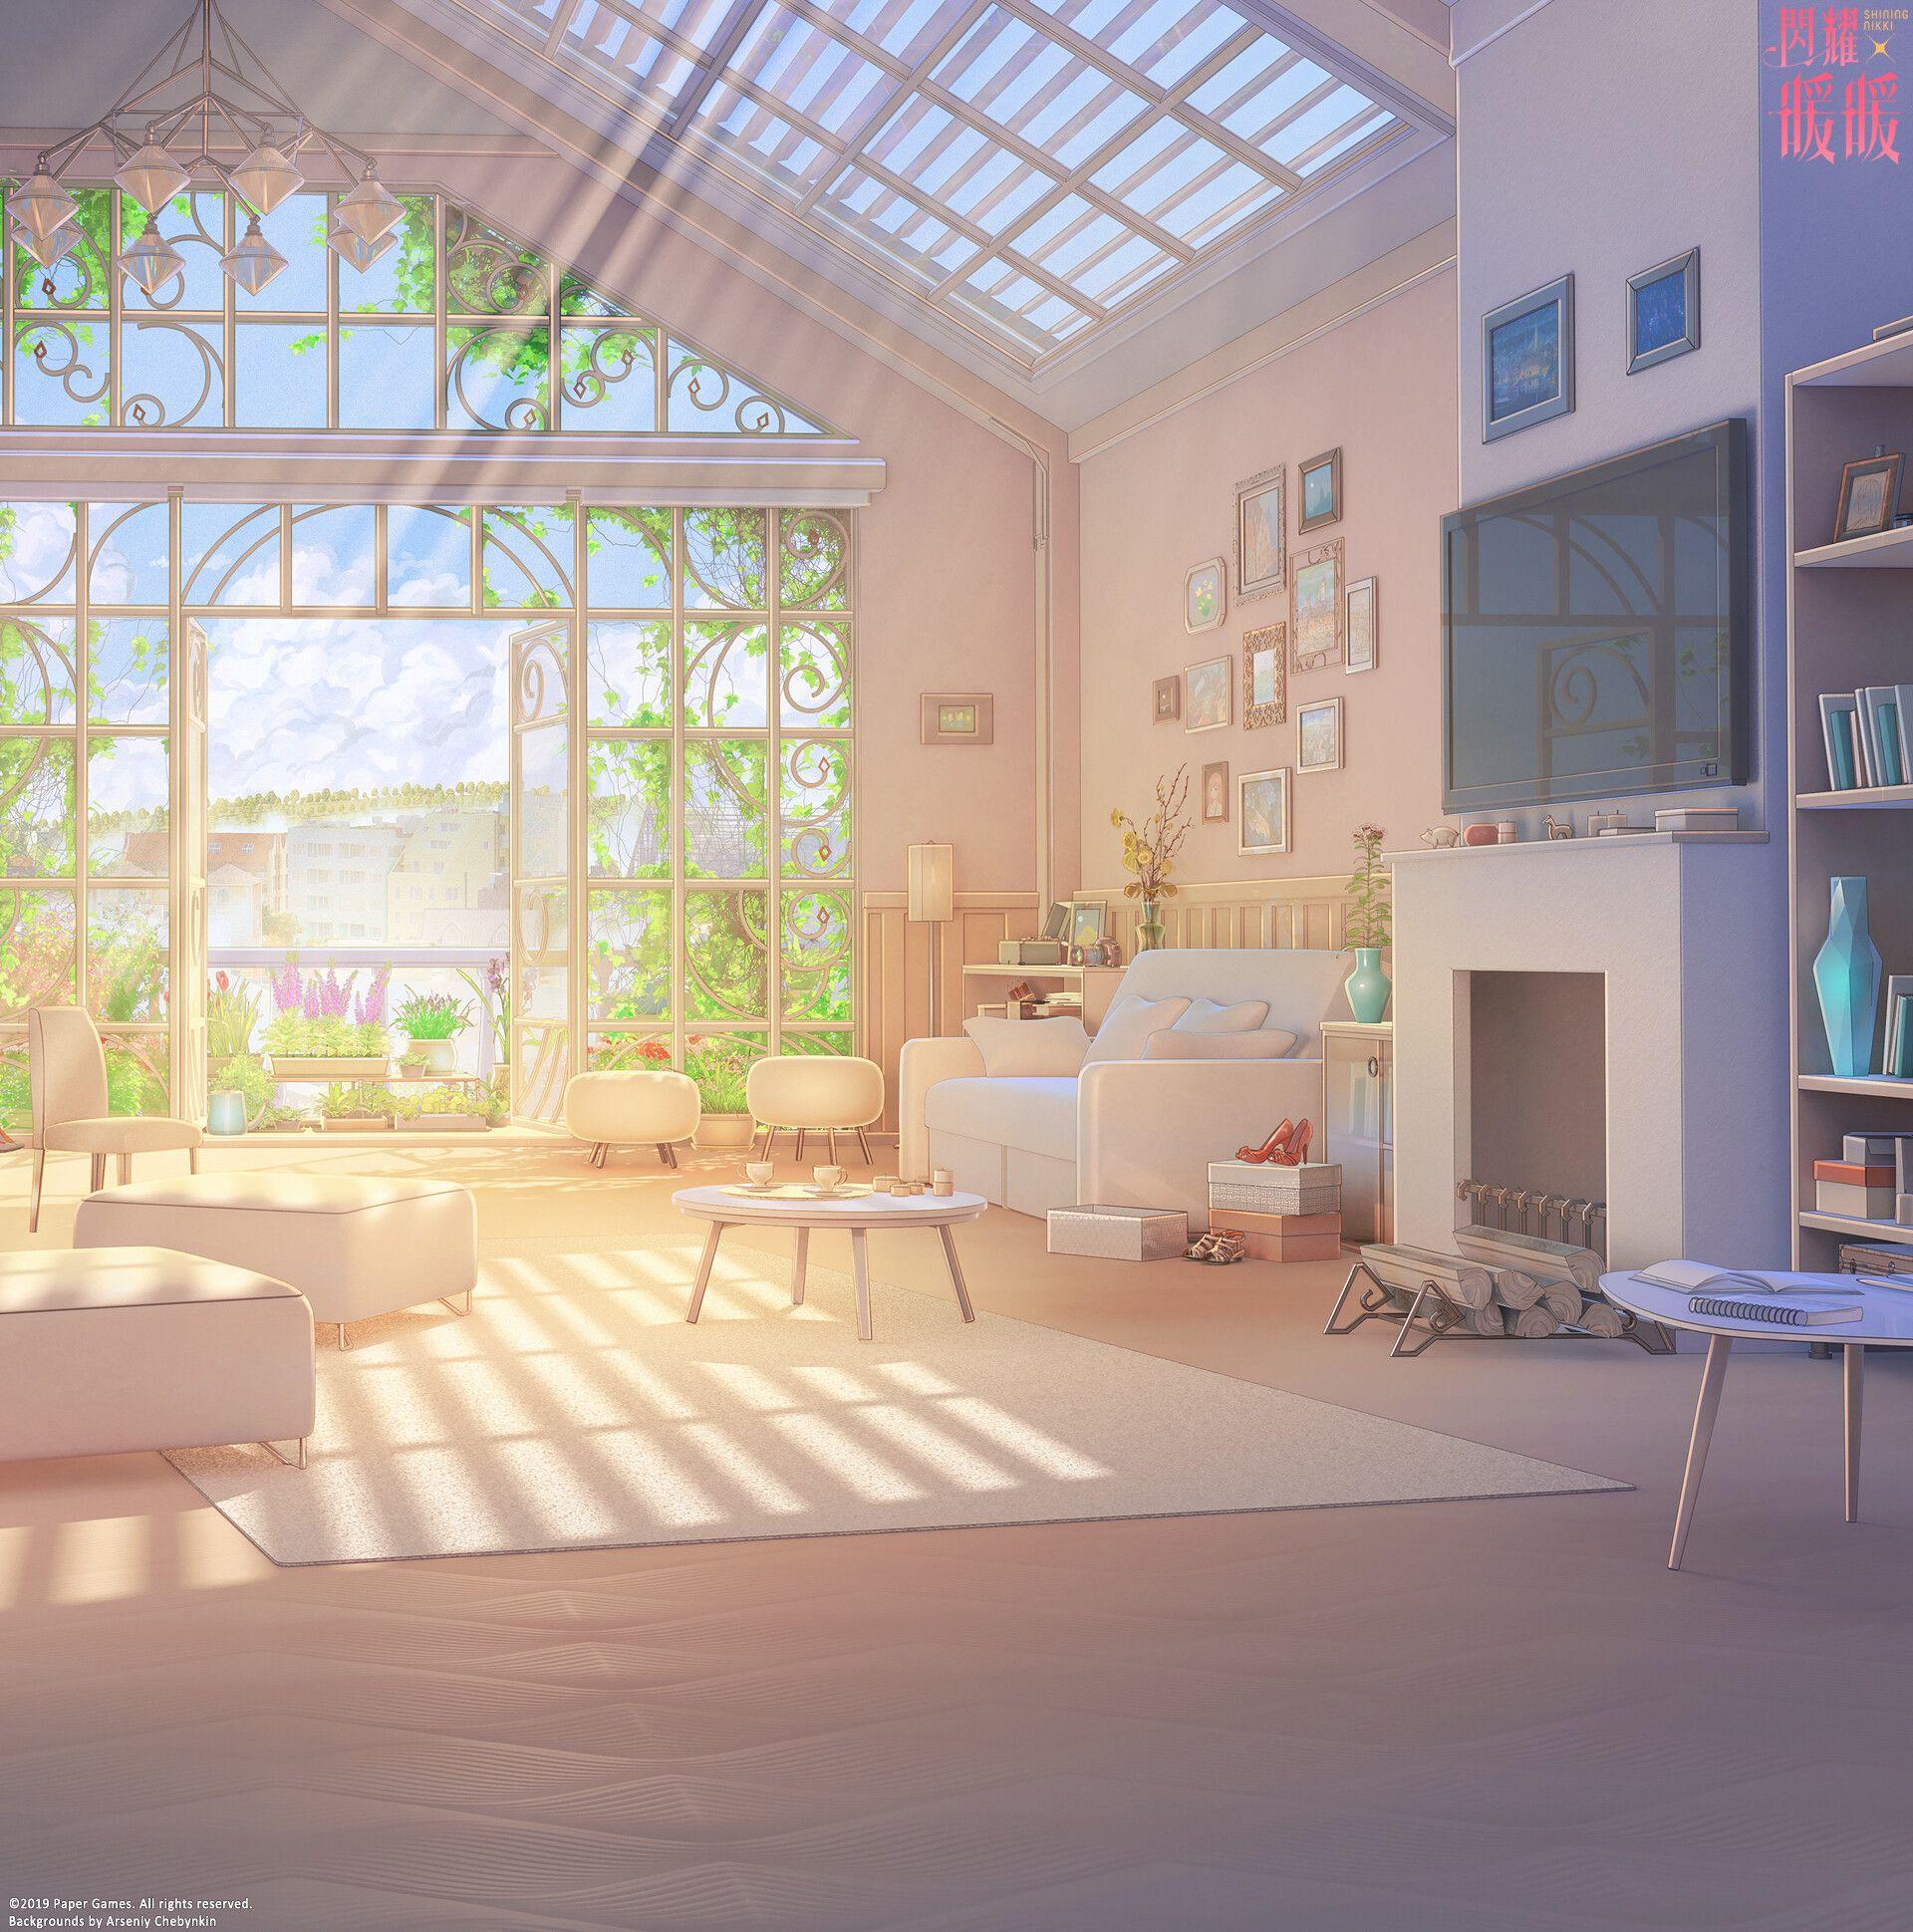 Artstation Nikki Room Arseniy Chebynkin Anime Background Anime Places Anime Scenery